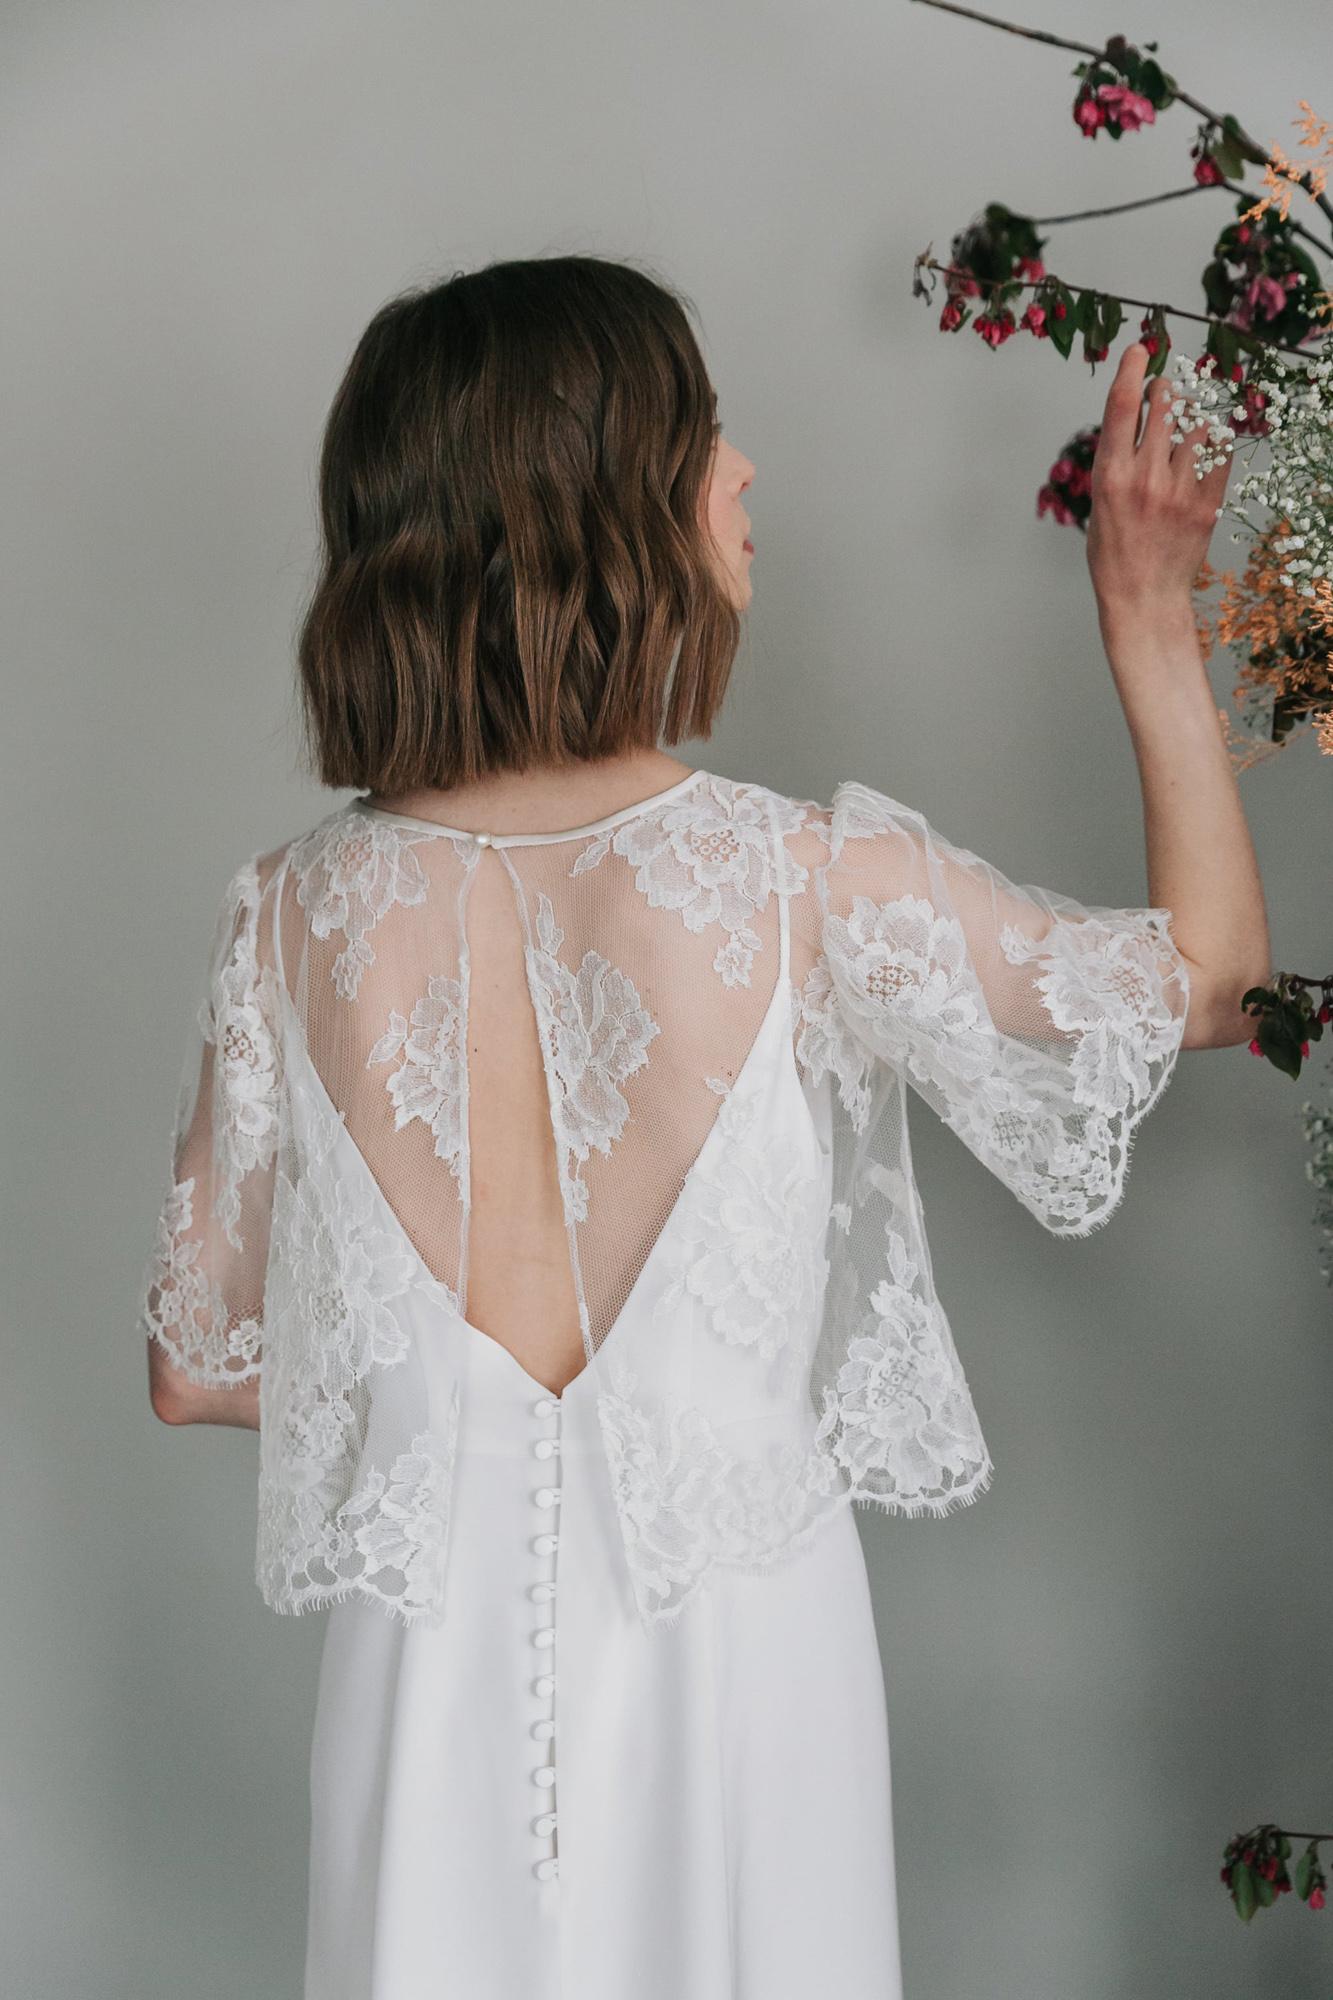 Kate-Beaumont-Sheffield-Rosa-Floral-Lace-Jacket-Snowdrop-Ivory-Matt-Silk-Modern-Wedding-Gown-5.jpg